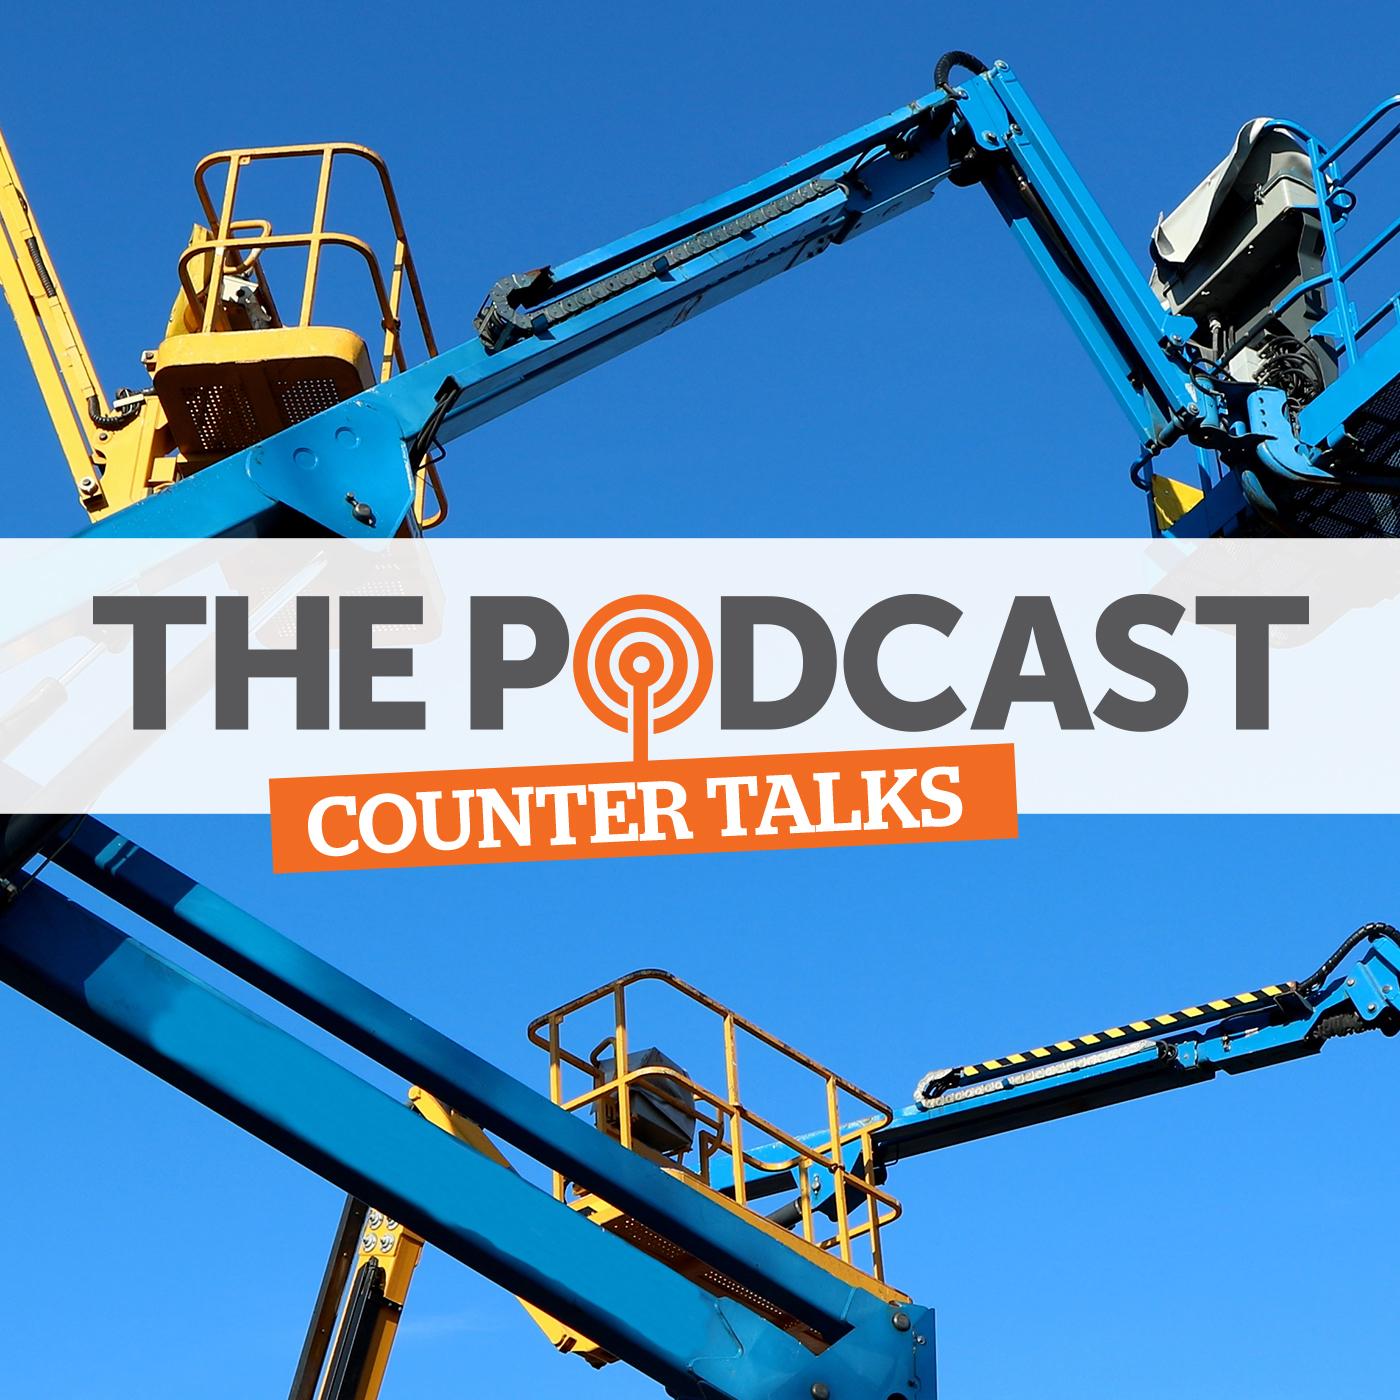 Artwork for podcast Counter Talks